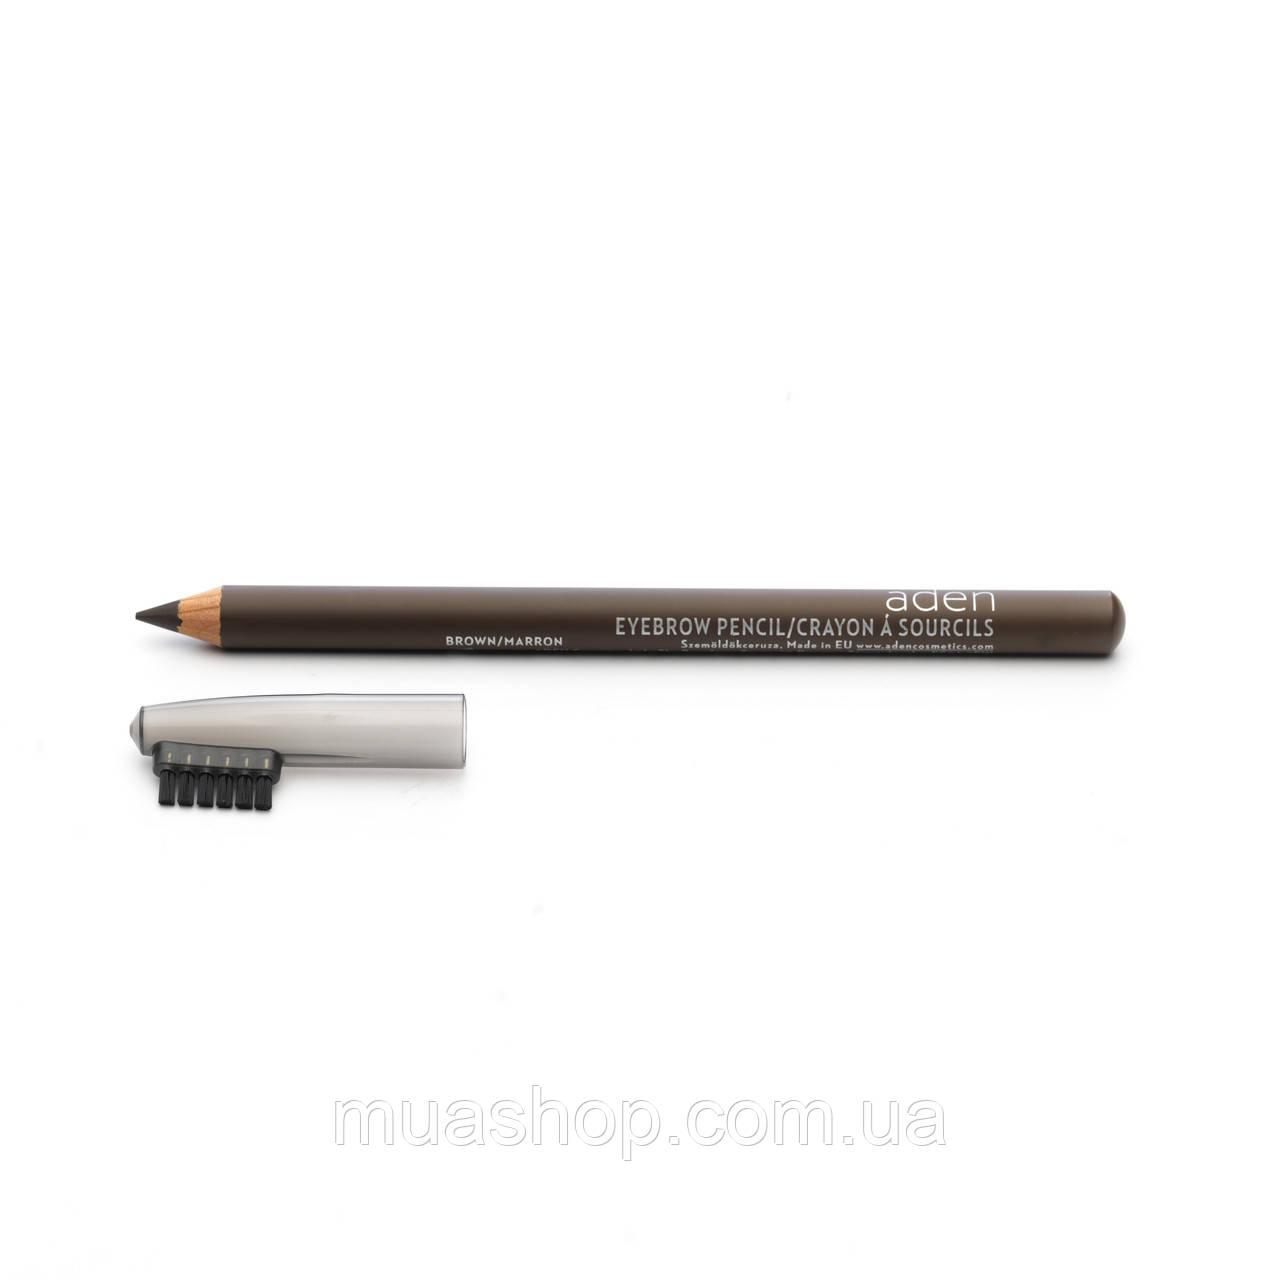 Aden Карандаш для бровей 076 Eyebrow Pencil (Brown) 1,14 gr